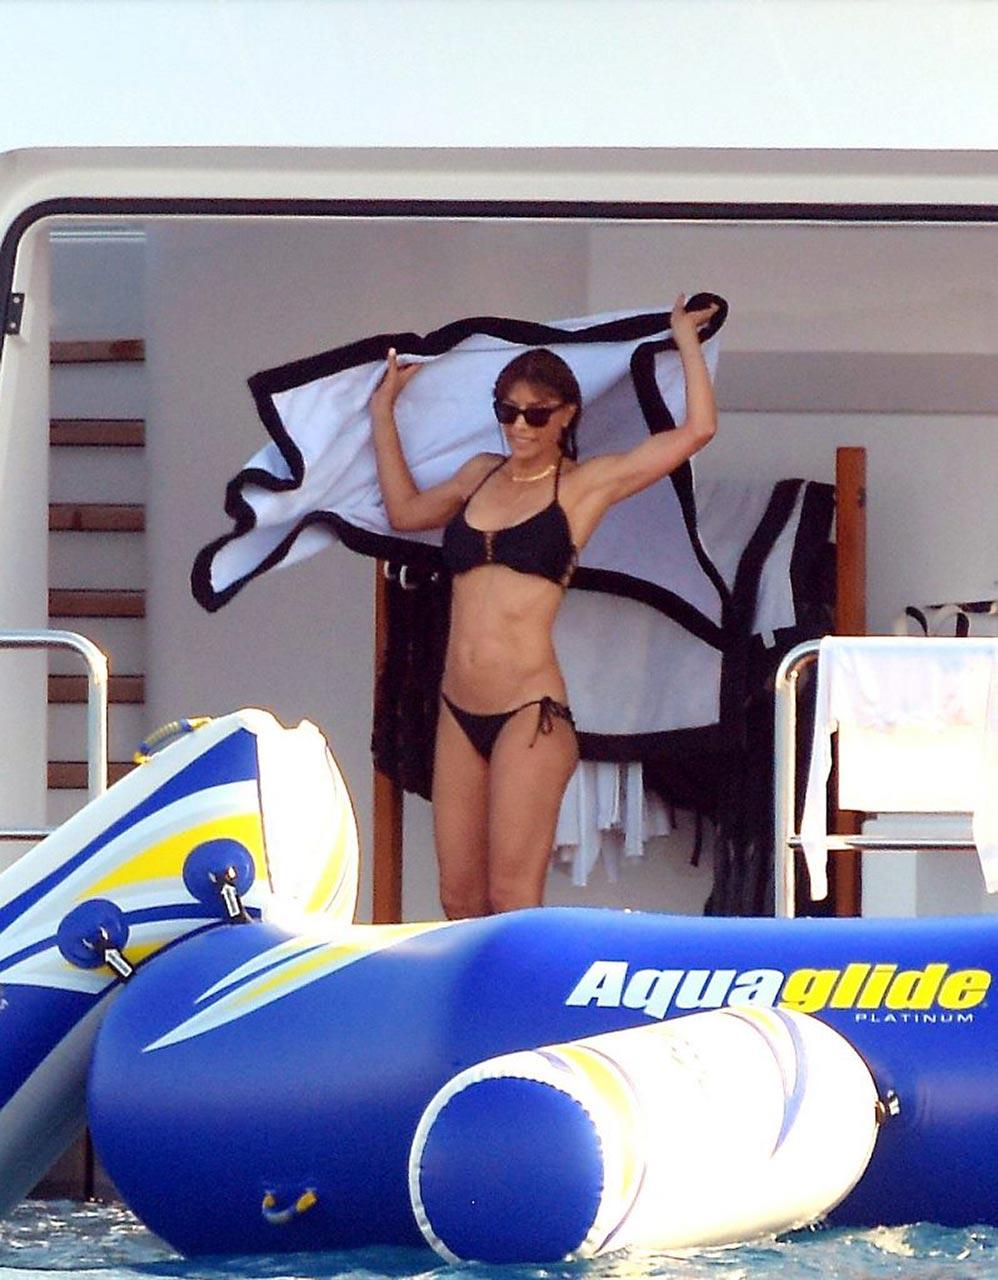 Consider, Jennifer flavin naked pics